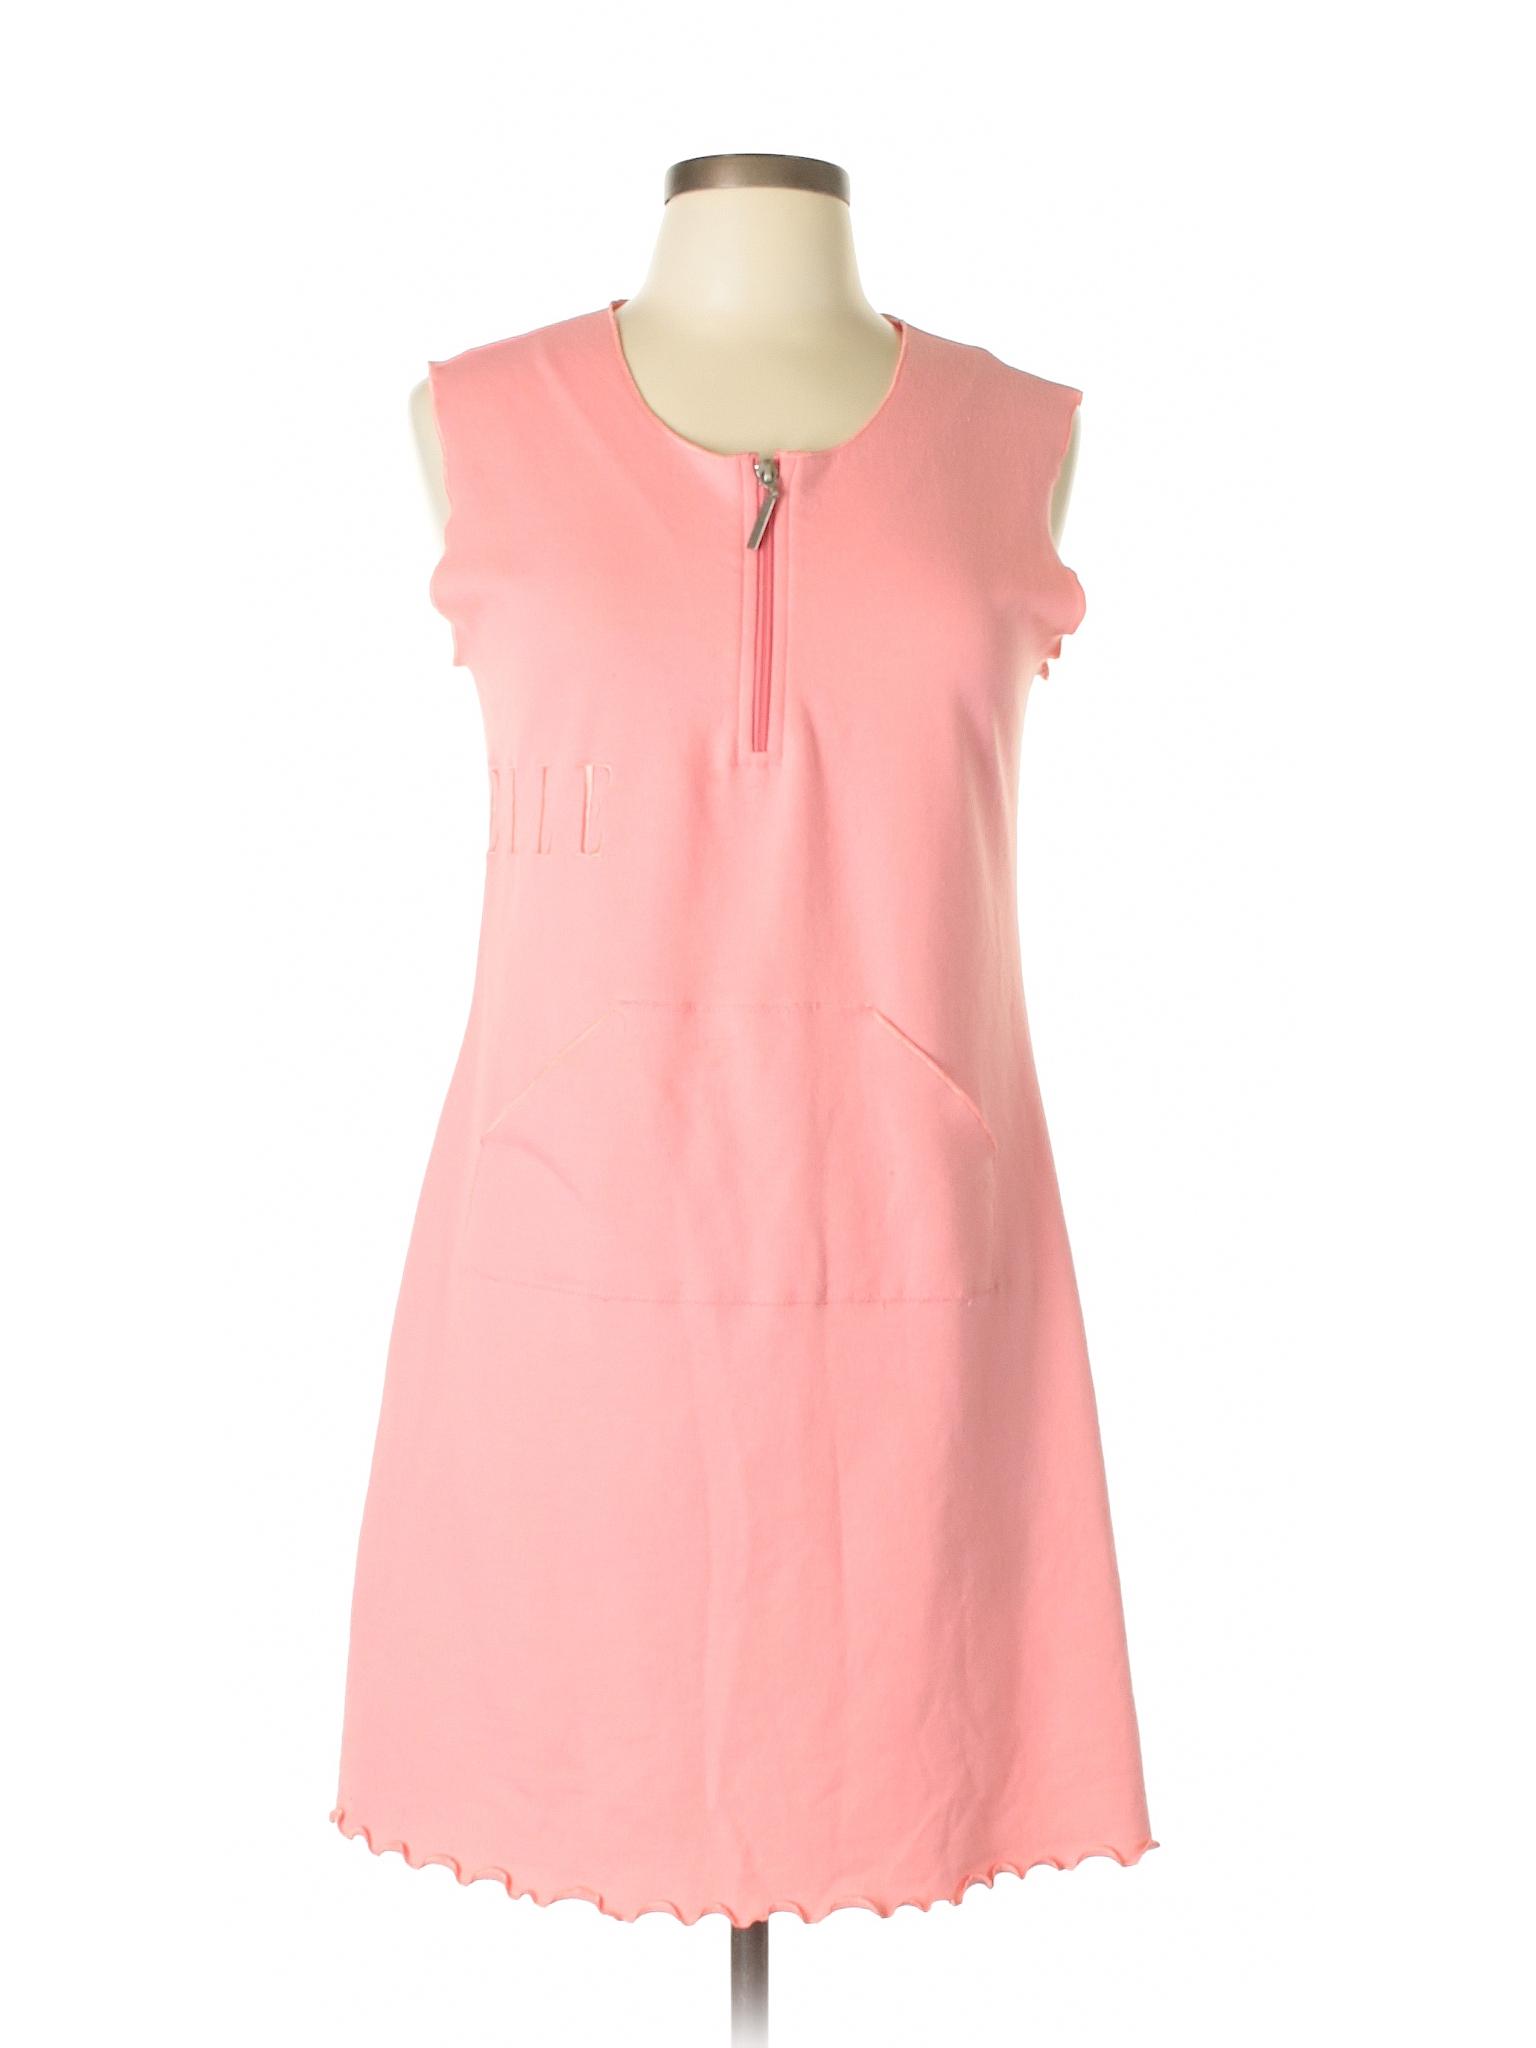 Elle Casual Elle Dress Selling Casual Selling Dress w7qPHHI1